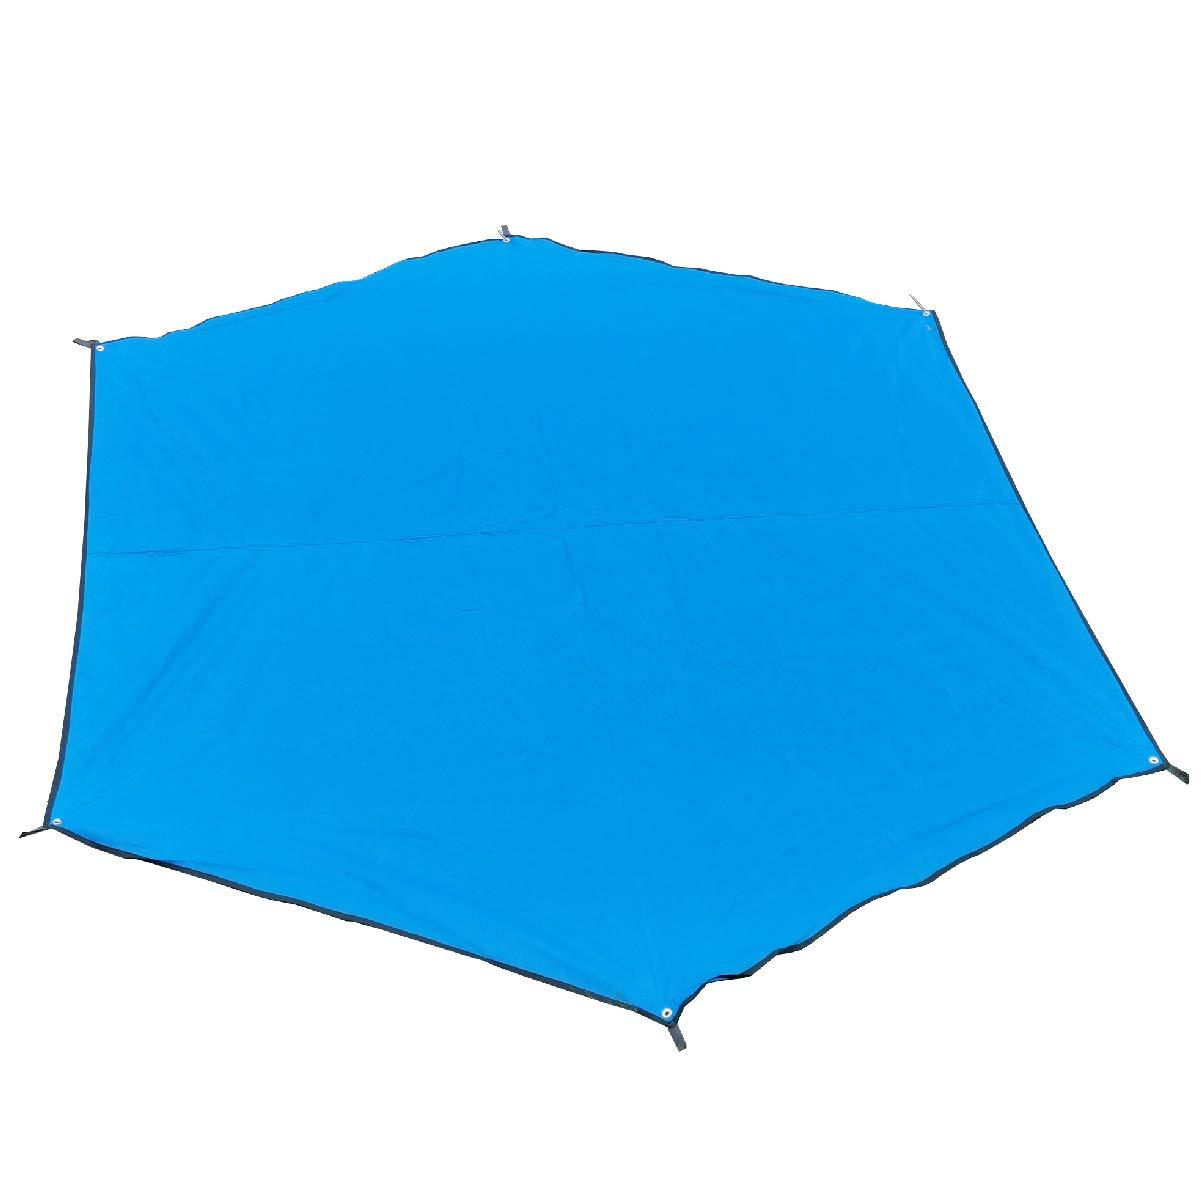 TRIWONDER Waterproof Hexagonal Hammock Rain Fly Tent Tarp Footprint Ground Cloth Camping Shelter Sunshade Beach Picnic Mat for Hiking Picnic (Blue - XL - Tarp Only) by TRIWONDER